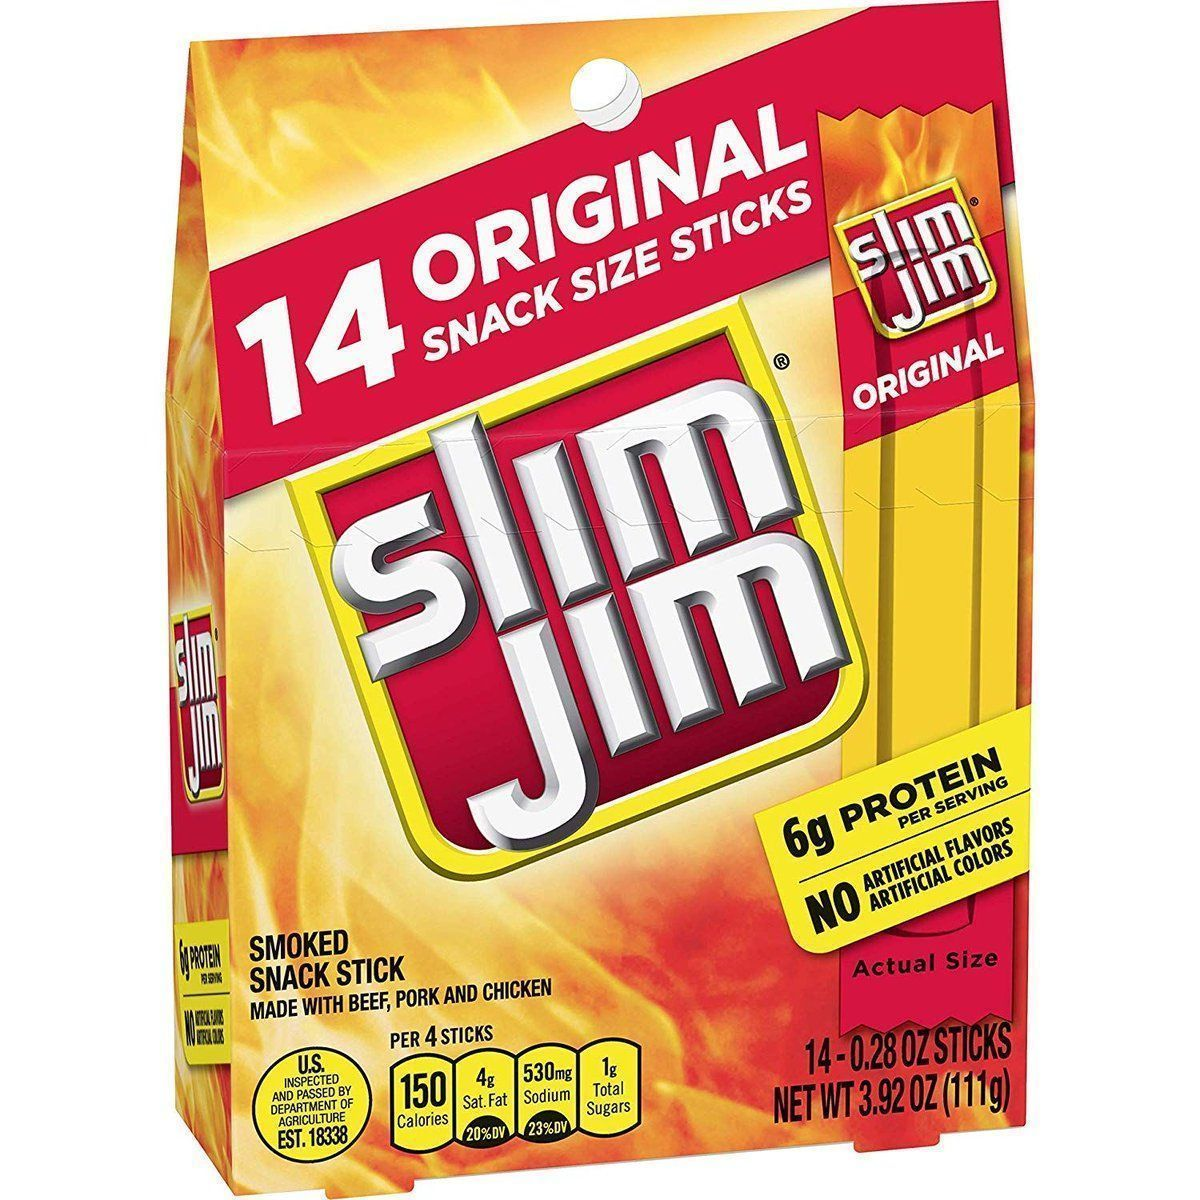 14 pack of Slim Jim- as low as $2.51! buff.ly/2V3OV5e